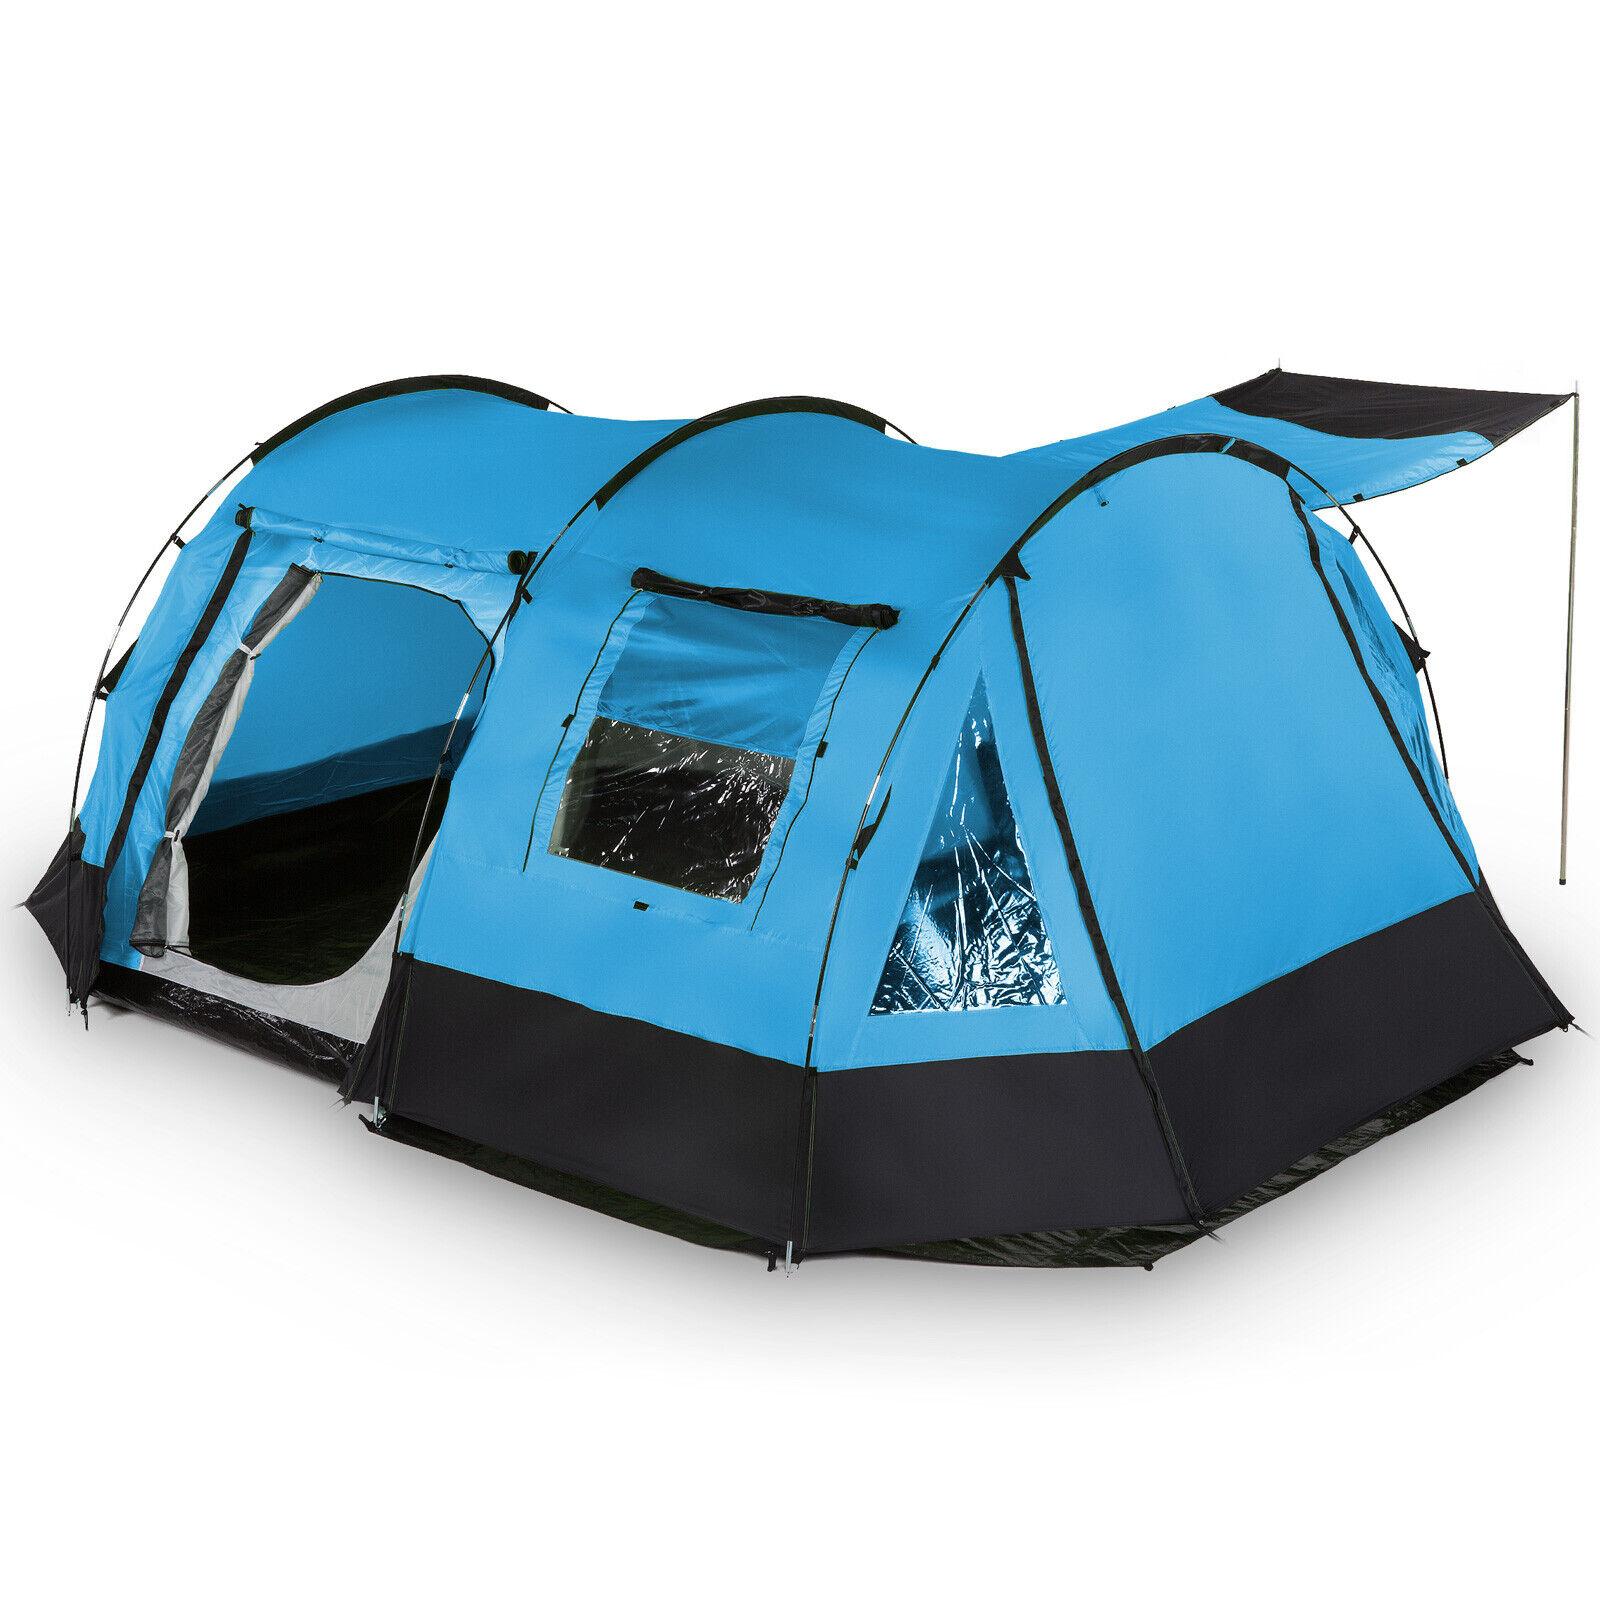 Skandika kambo 4 personas familias tienda de camping tienda túnel mosquiteros nuevo